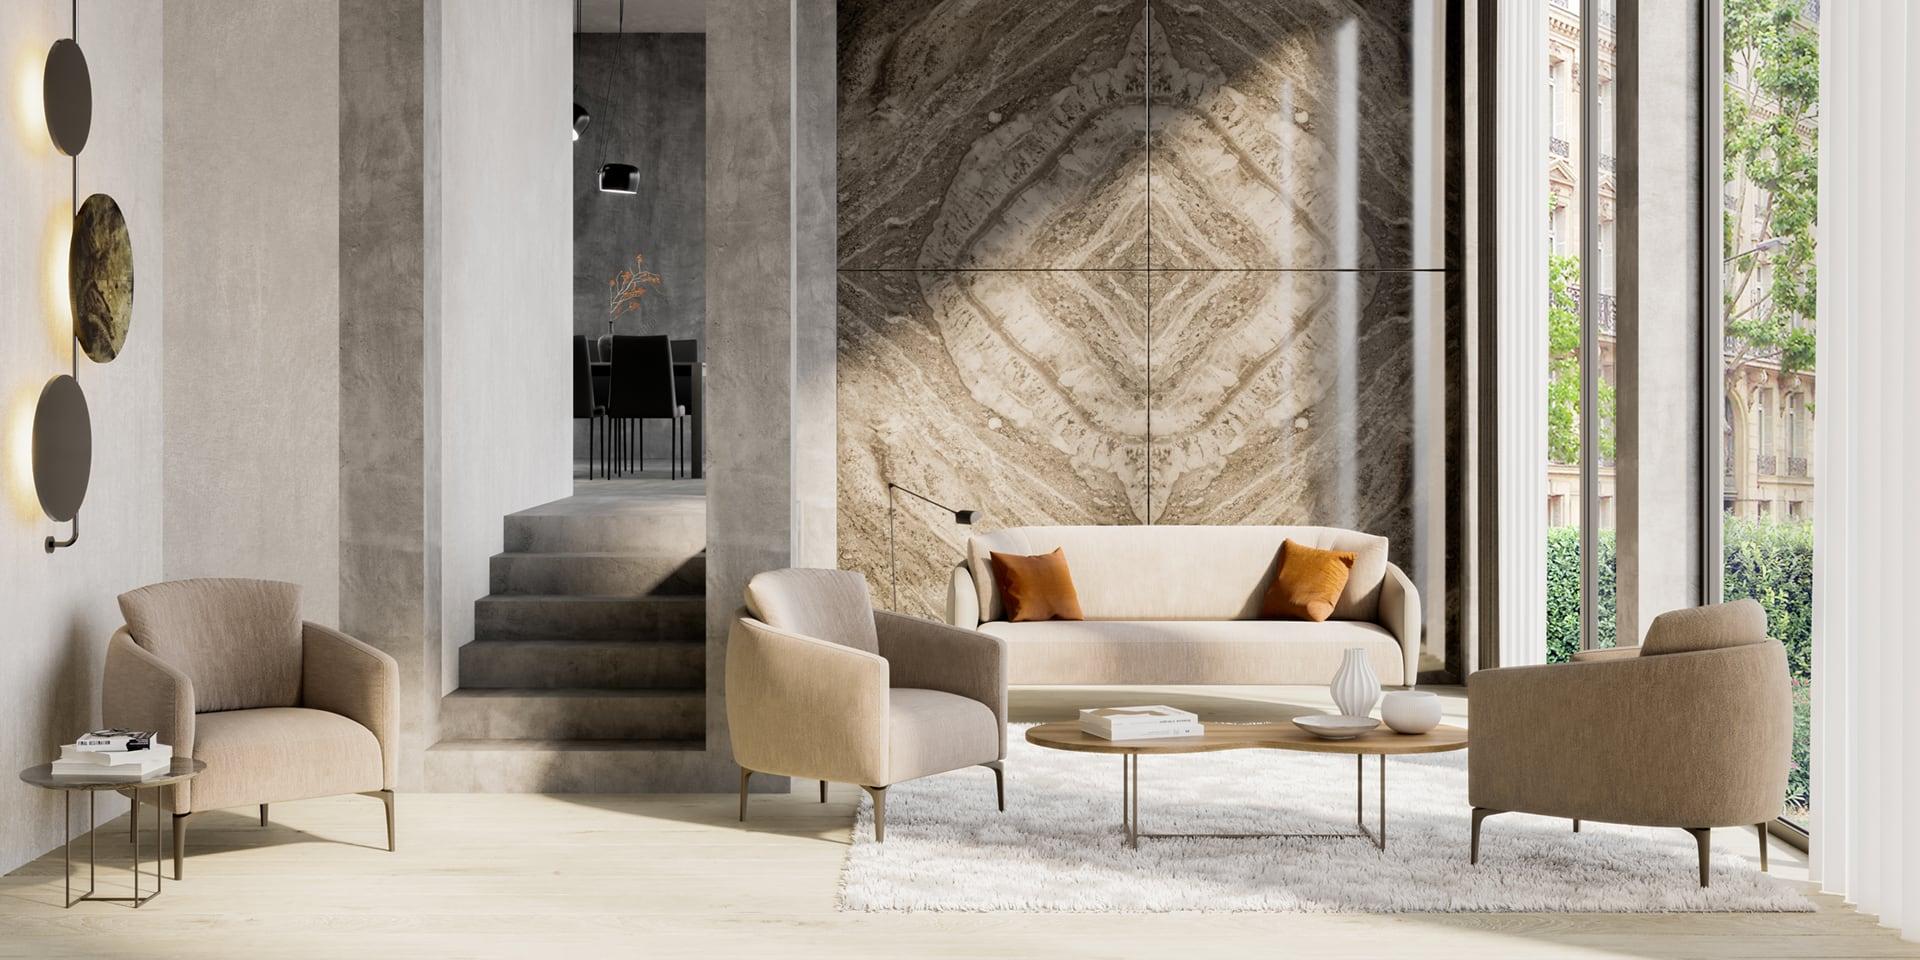 Showroom Meubels Design.Innovative Seating Comfort Since 1963 Design Furniture Jori